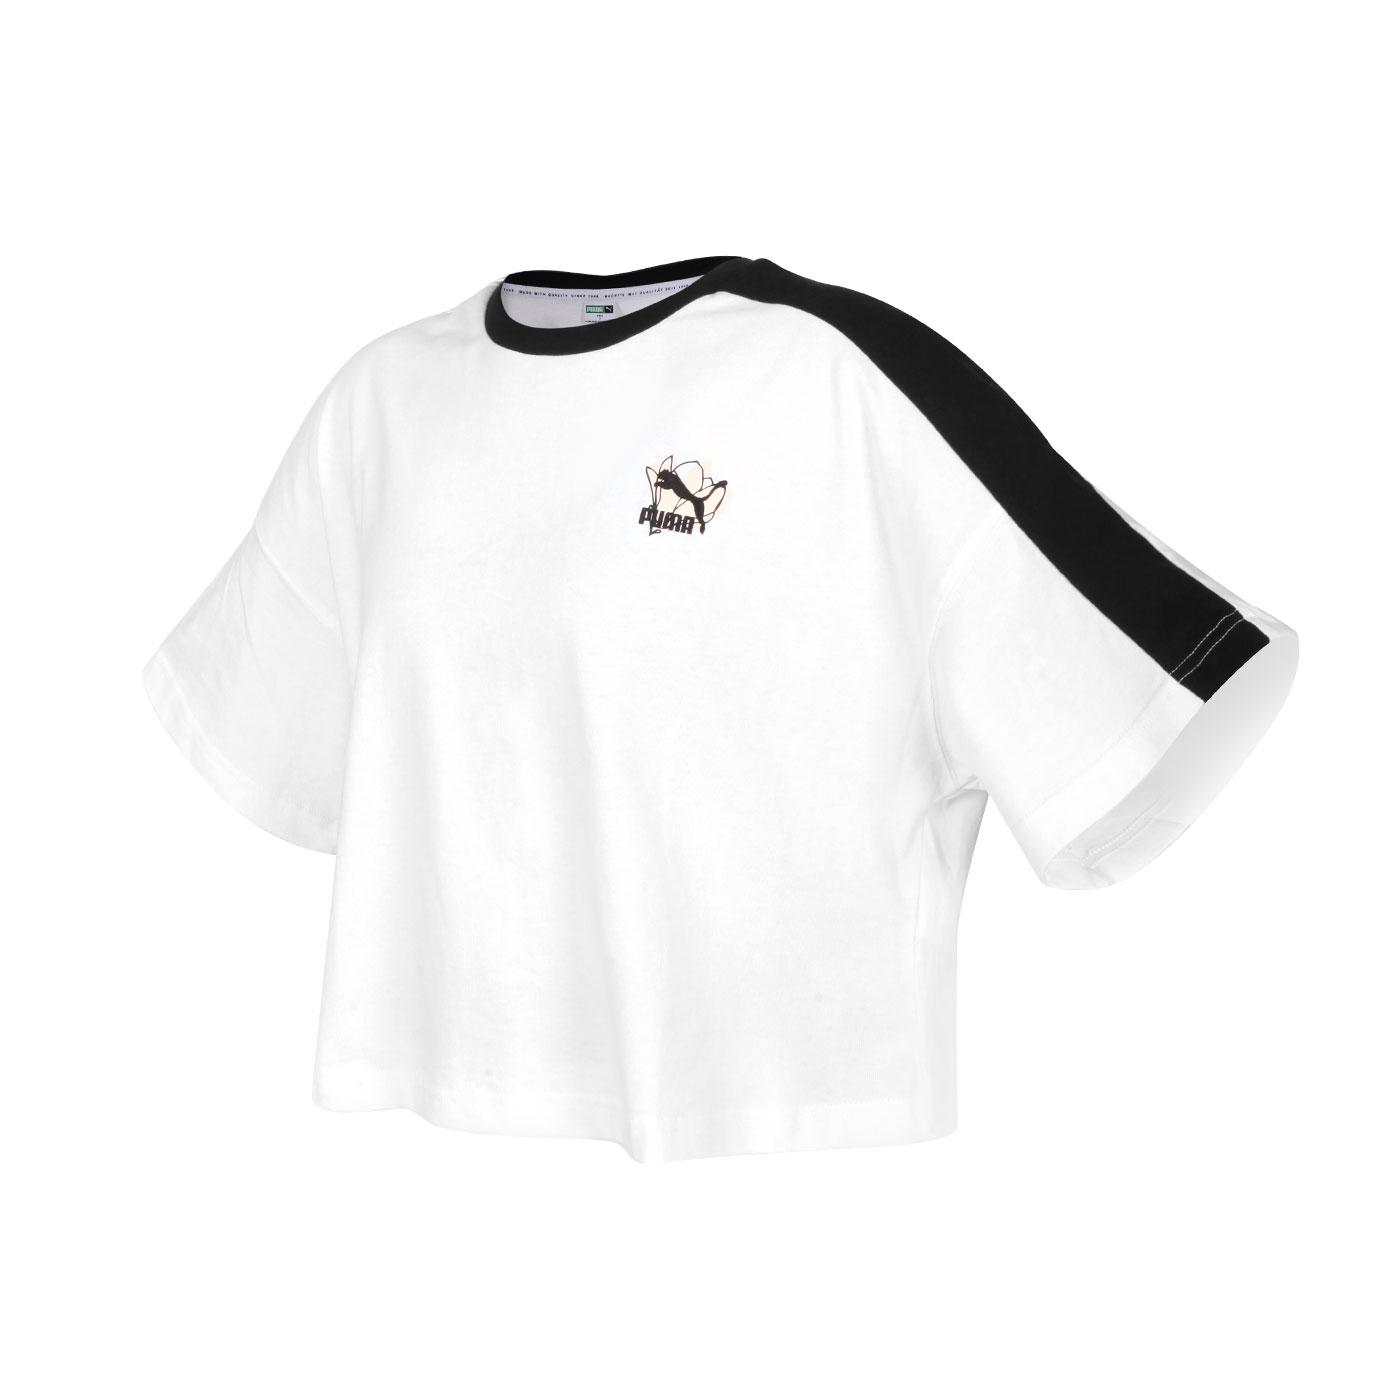 PUMA 女款Floral短袖T恤 53225802 - 白黑粉